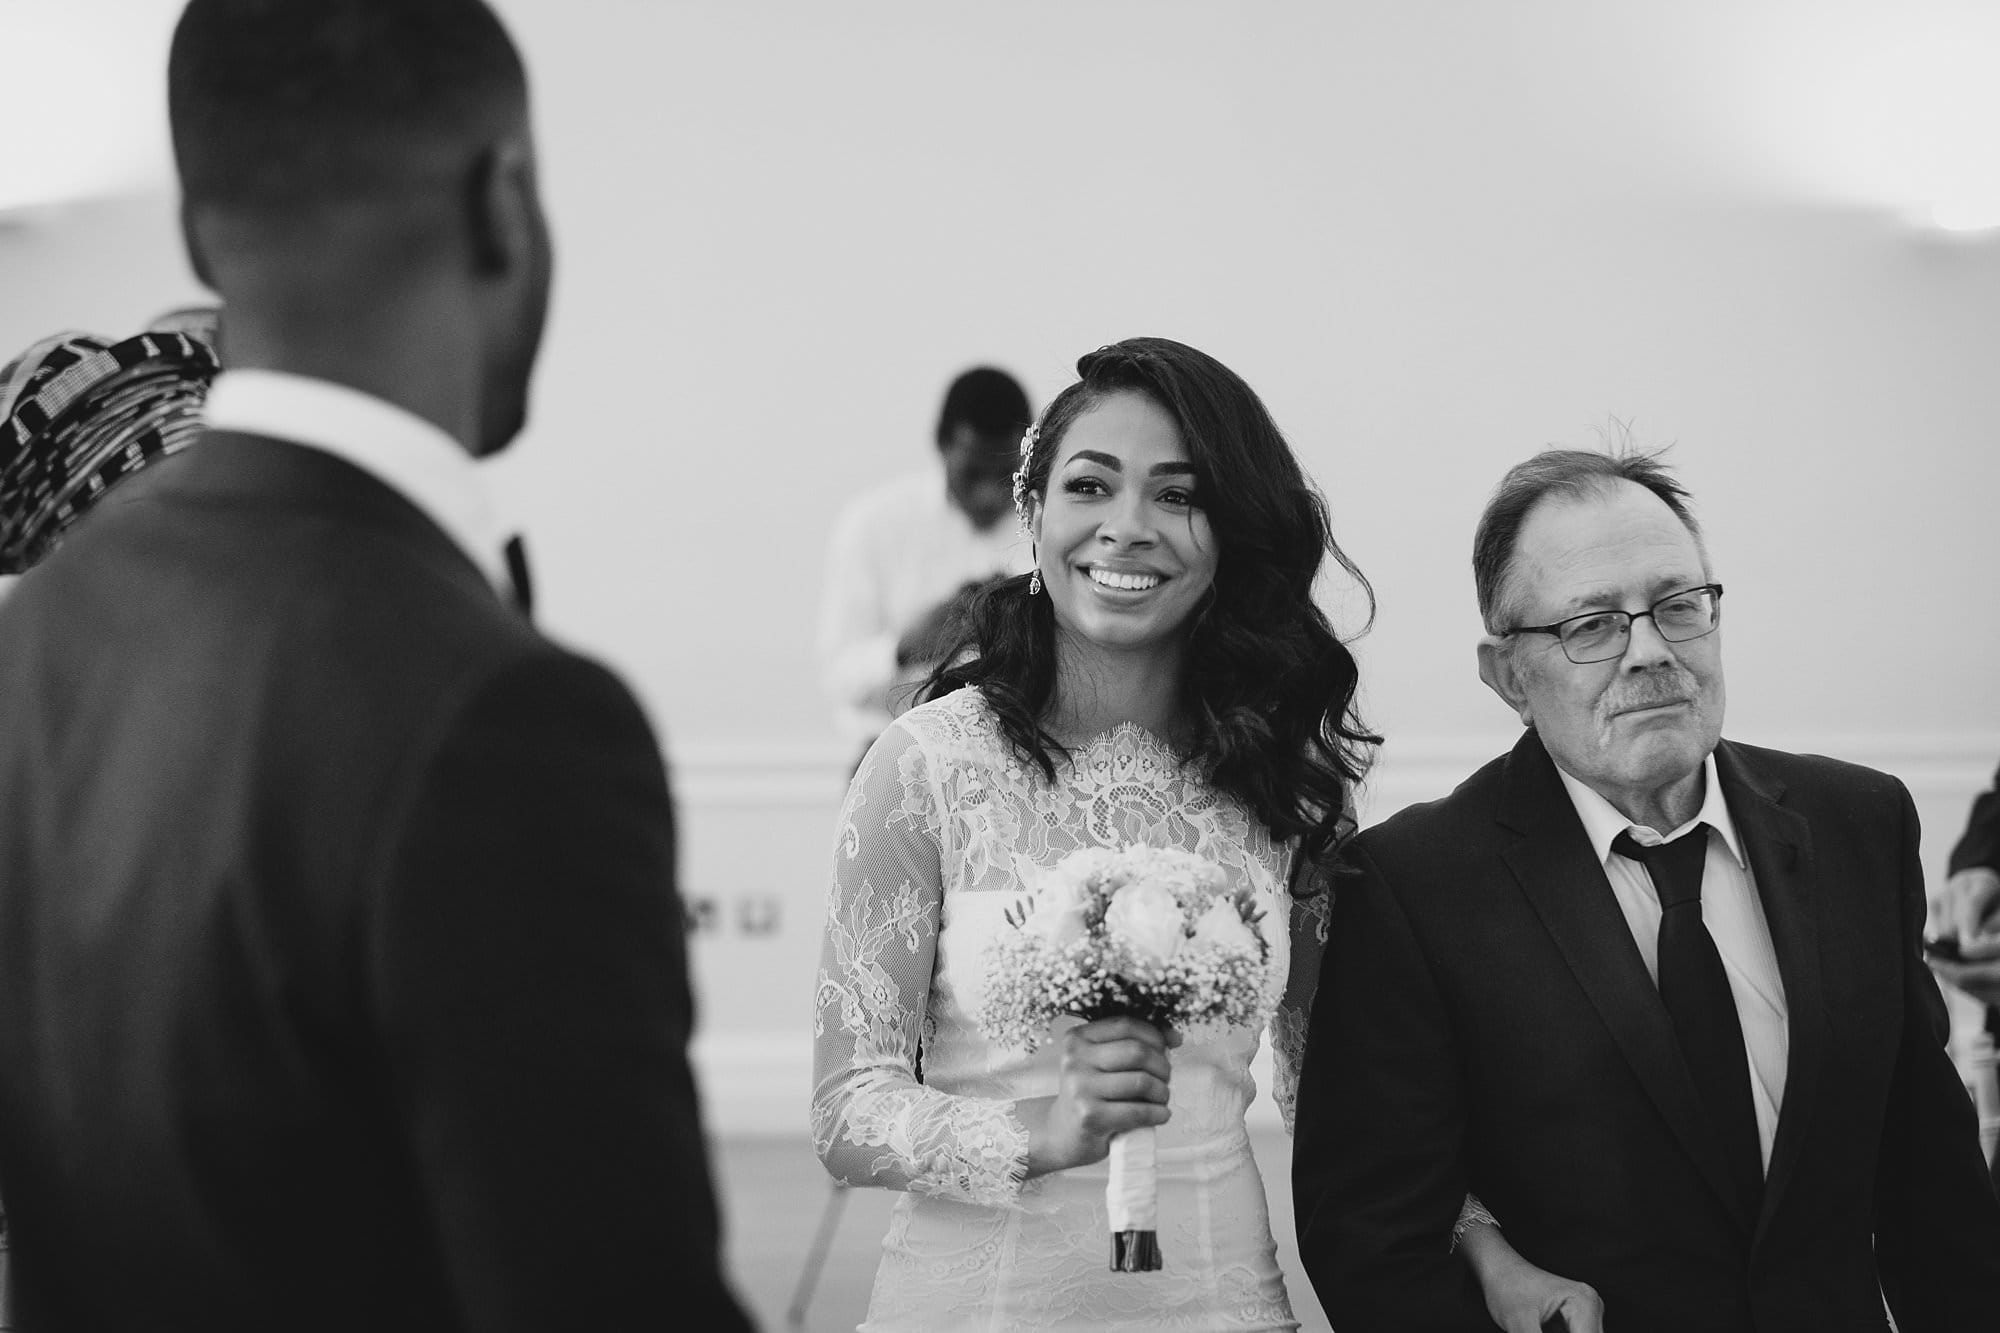 asia house london wedding photographer 019 - Rachel + Gabriel   Asia House Wedding Photography